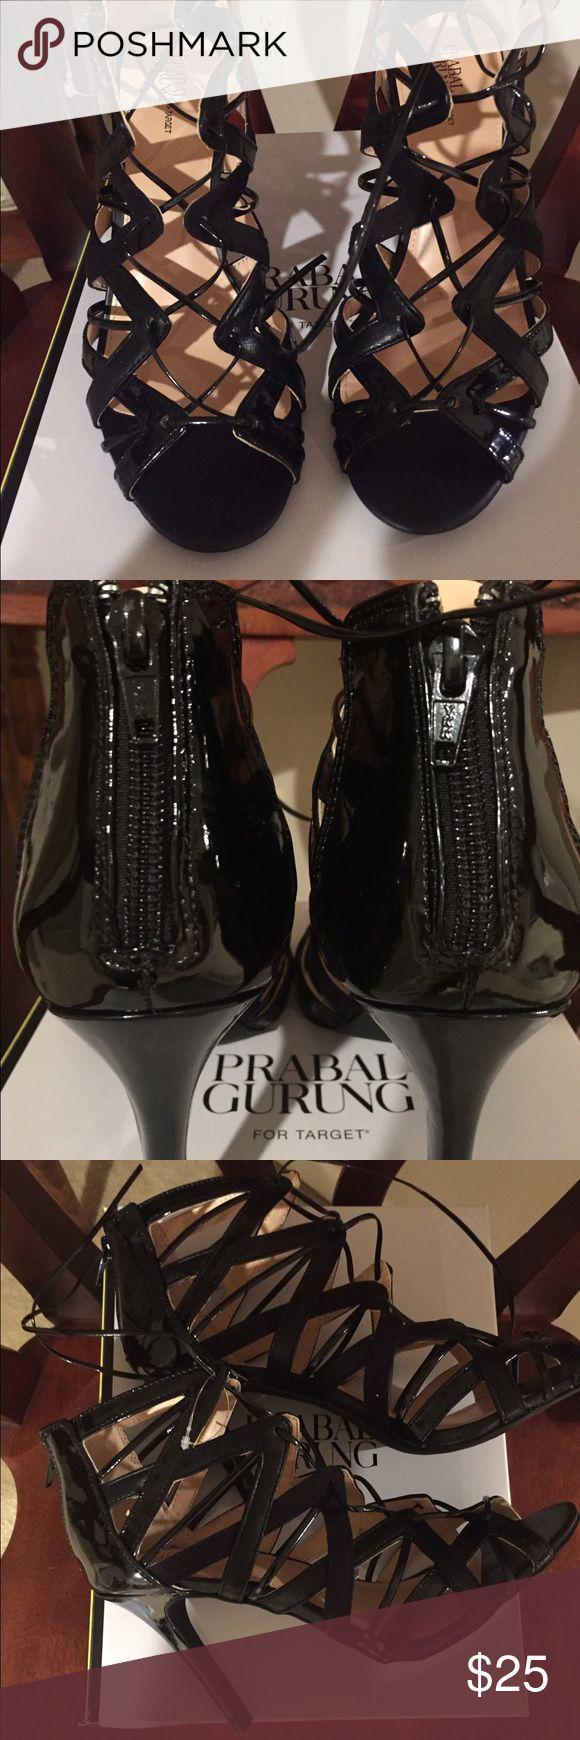 NIB REDUCED Ladies Strap Heels 👠 Brand New!! Sexy strap up, zip back, tie up heels. Patin look. Shoes Heels